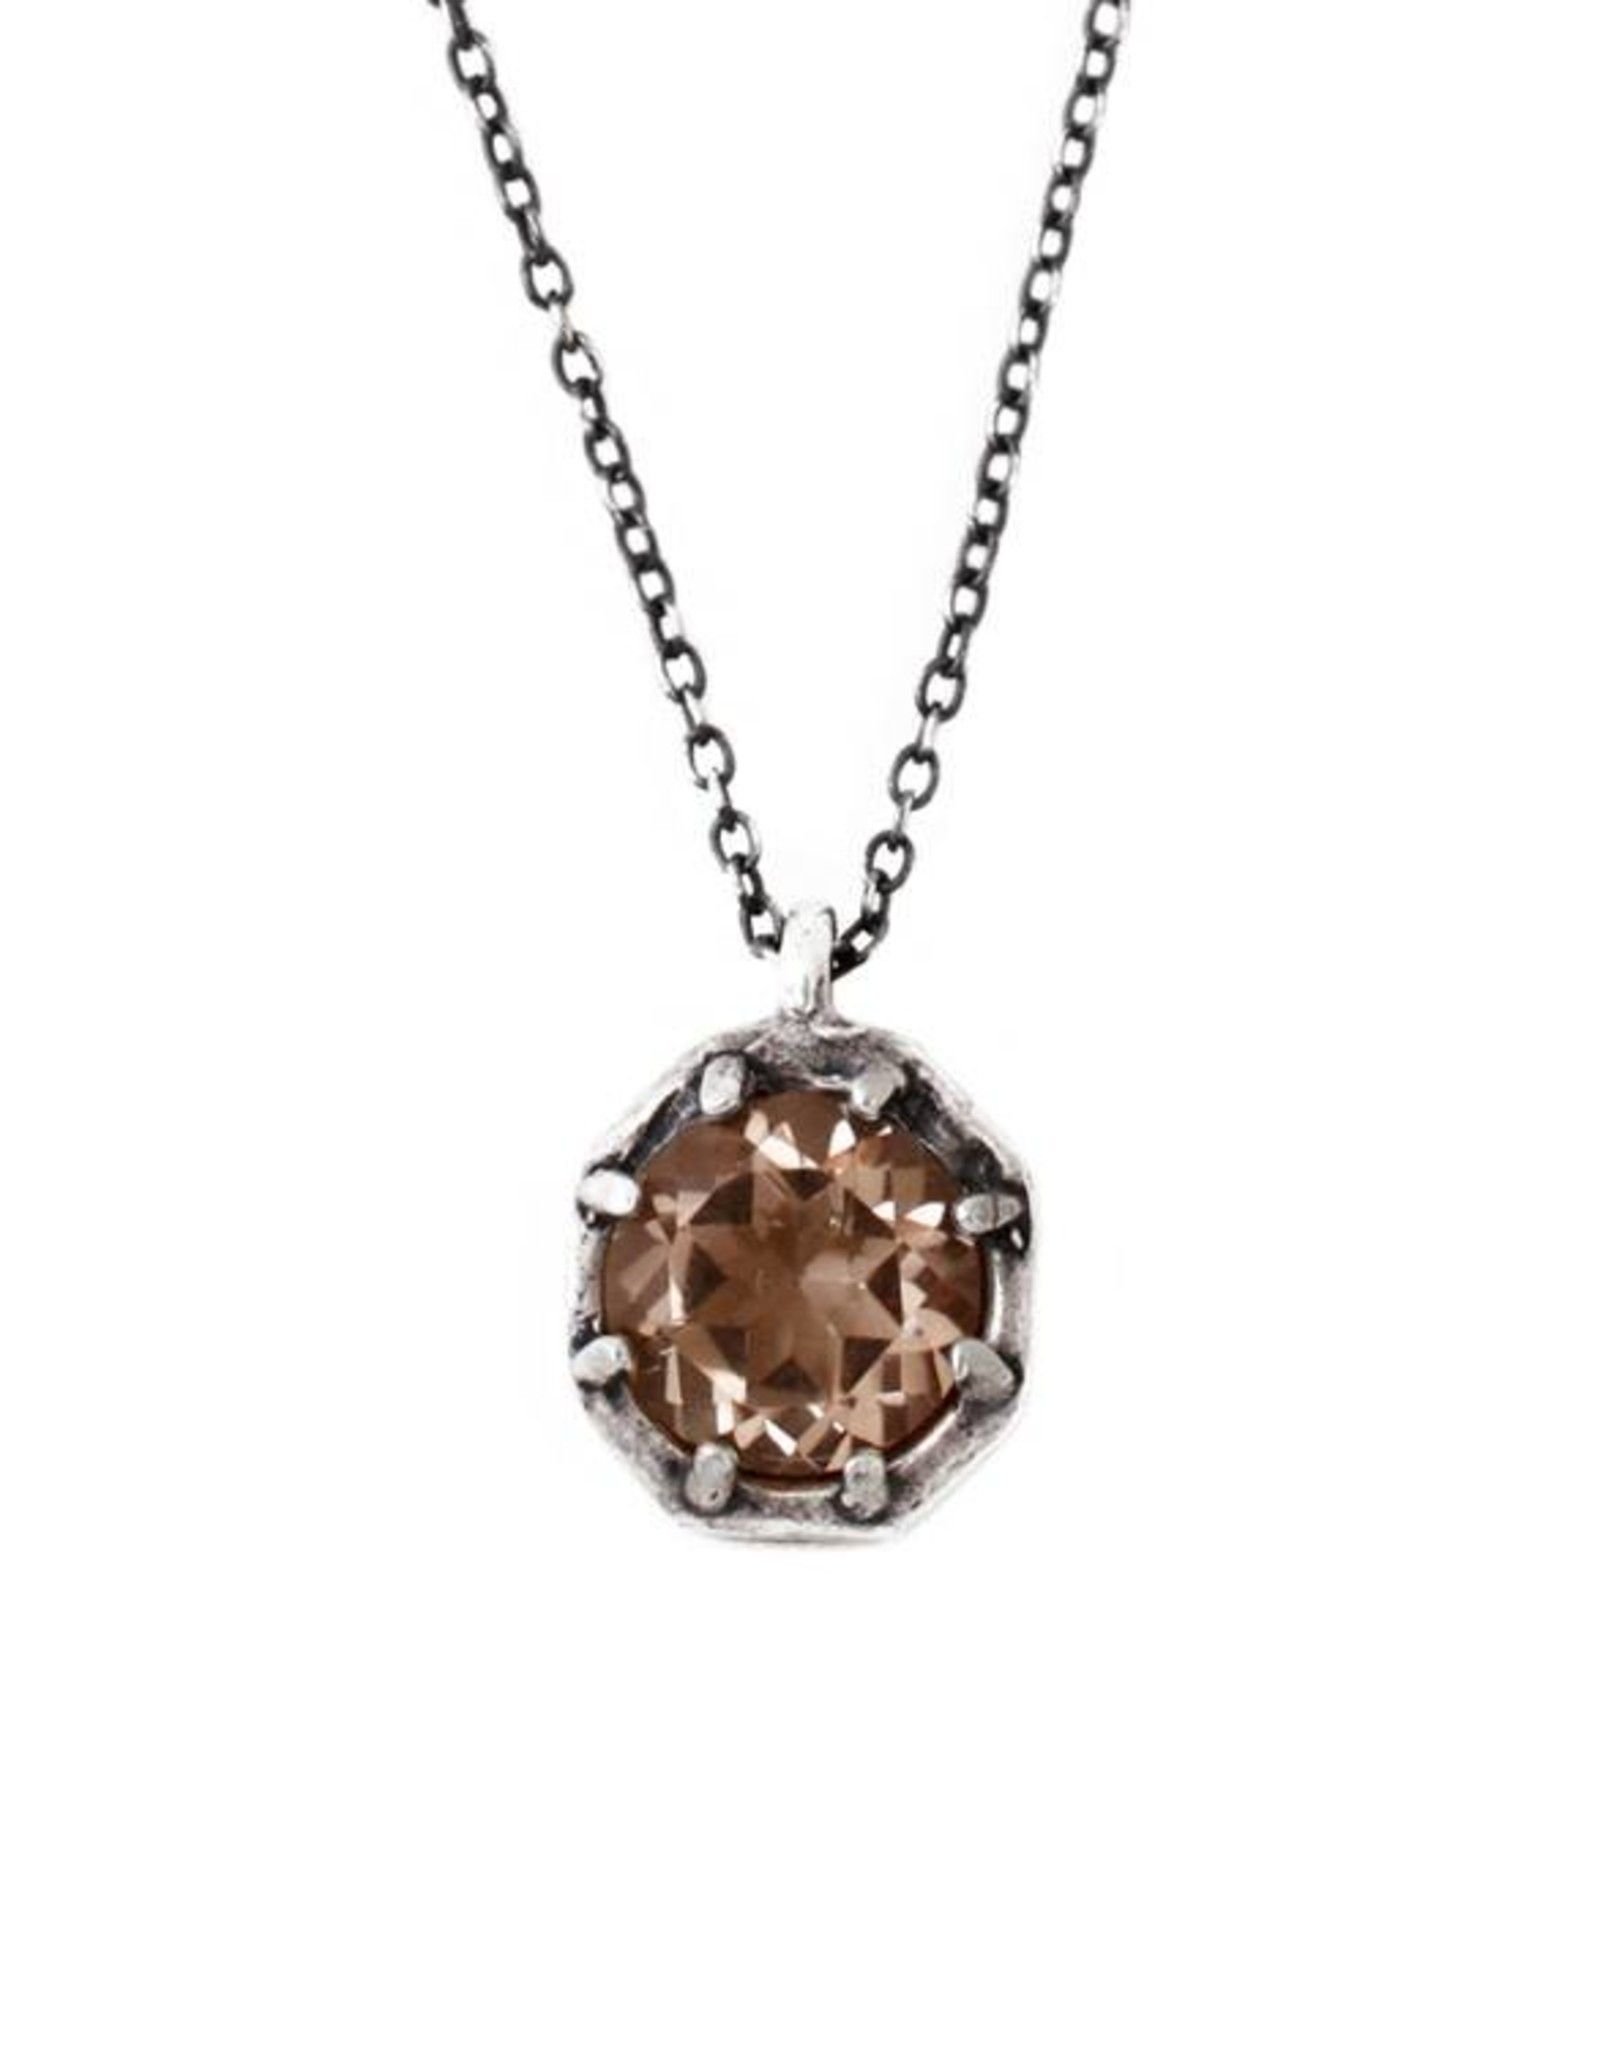 Lauren Wolf Jewelry Oxidized Silver Octagon Necklace - Champagne Quartz